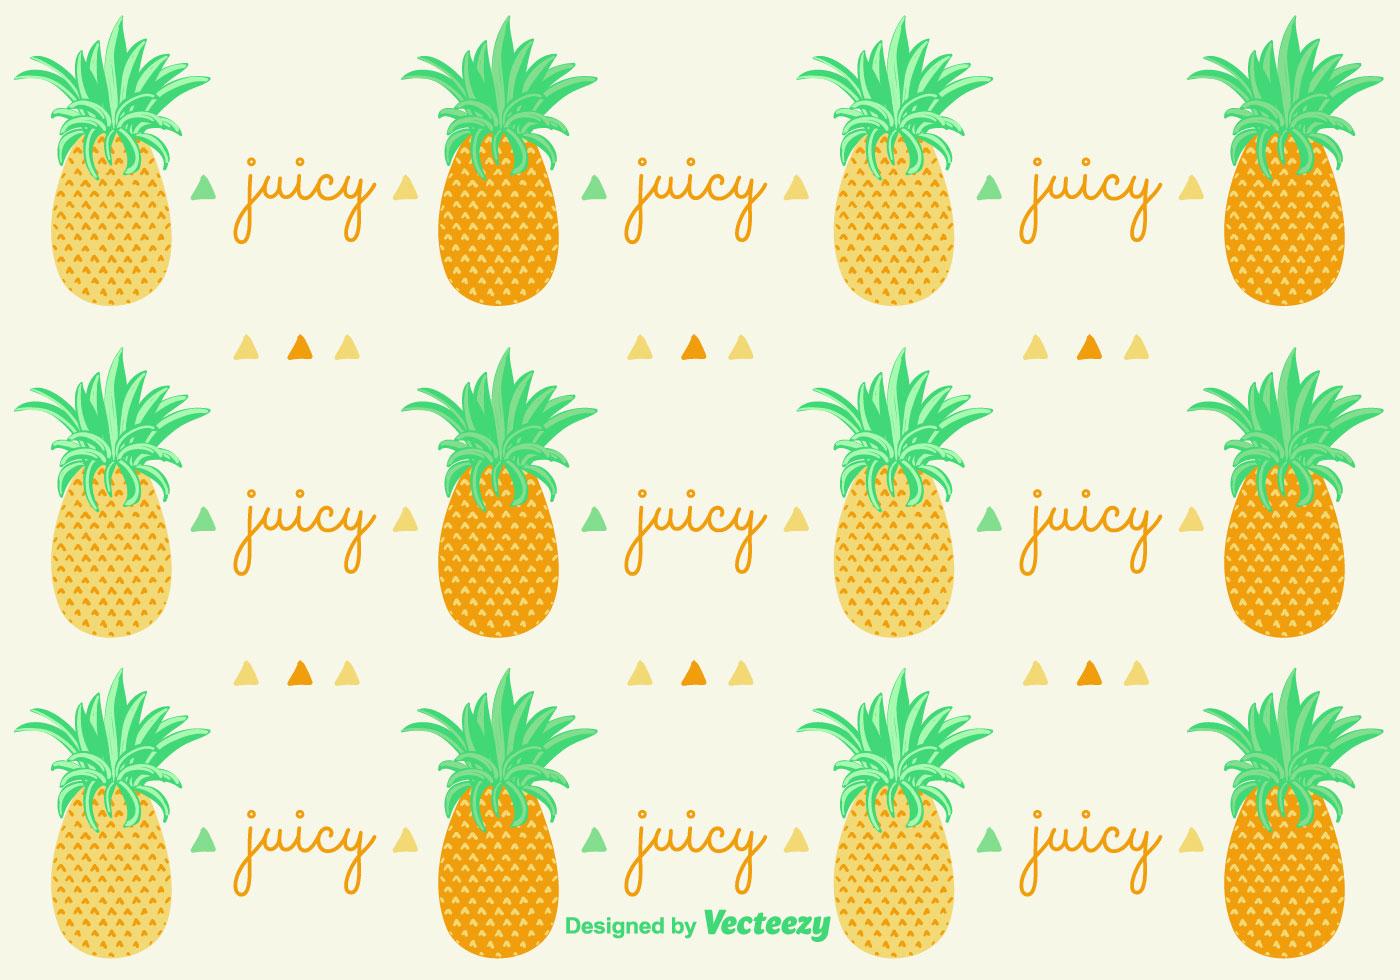 Pineapple pattern background - photo#9